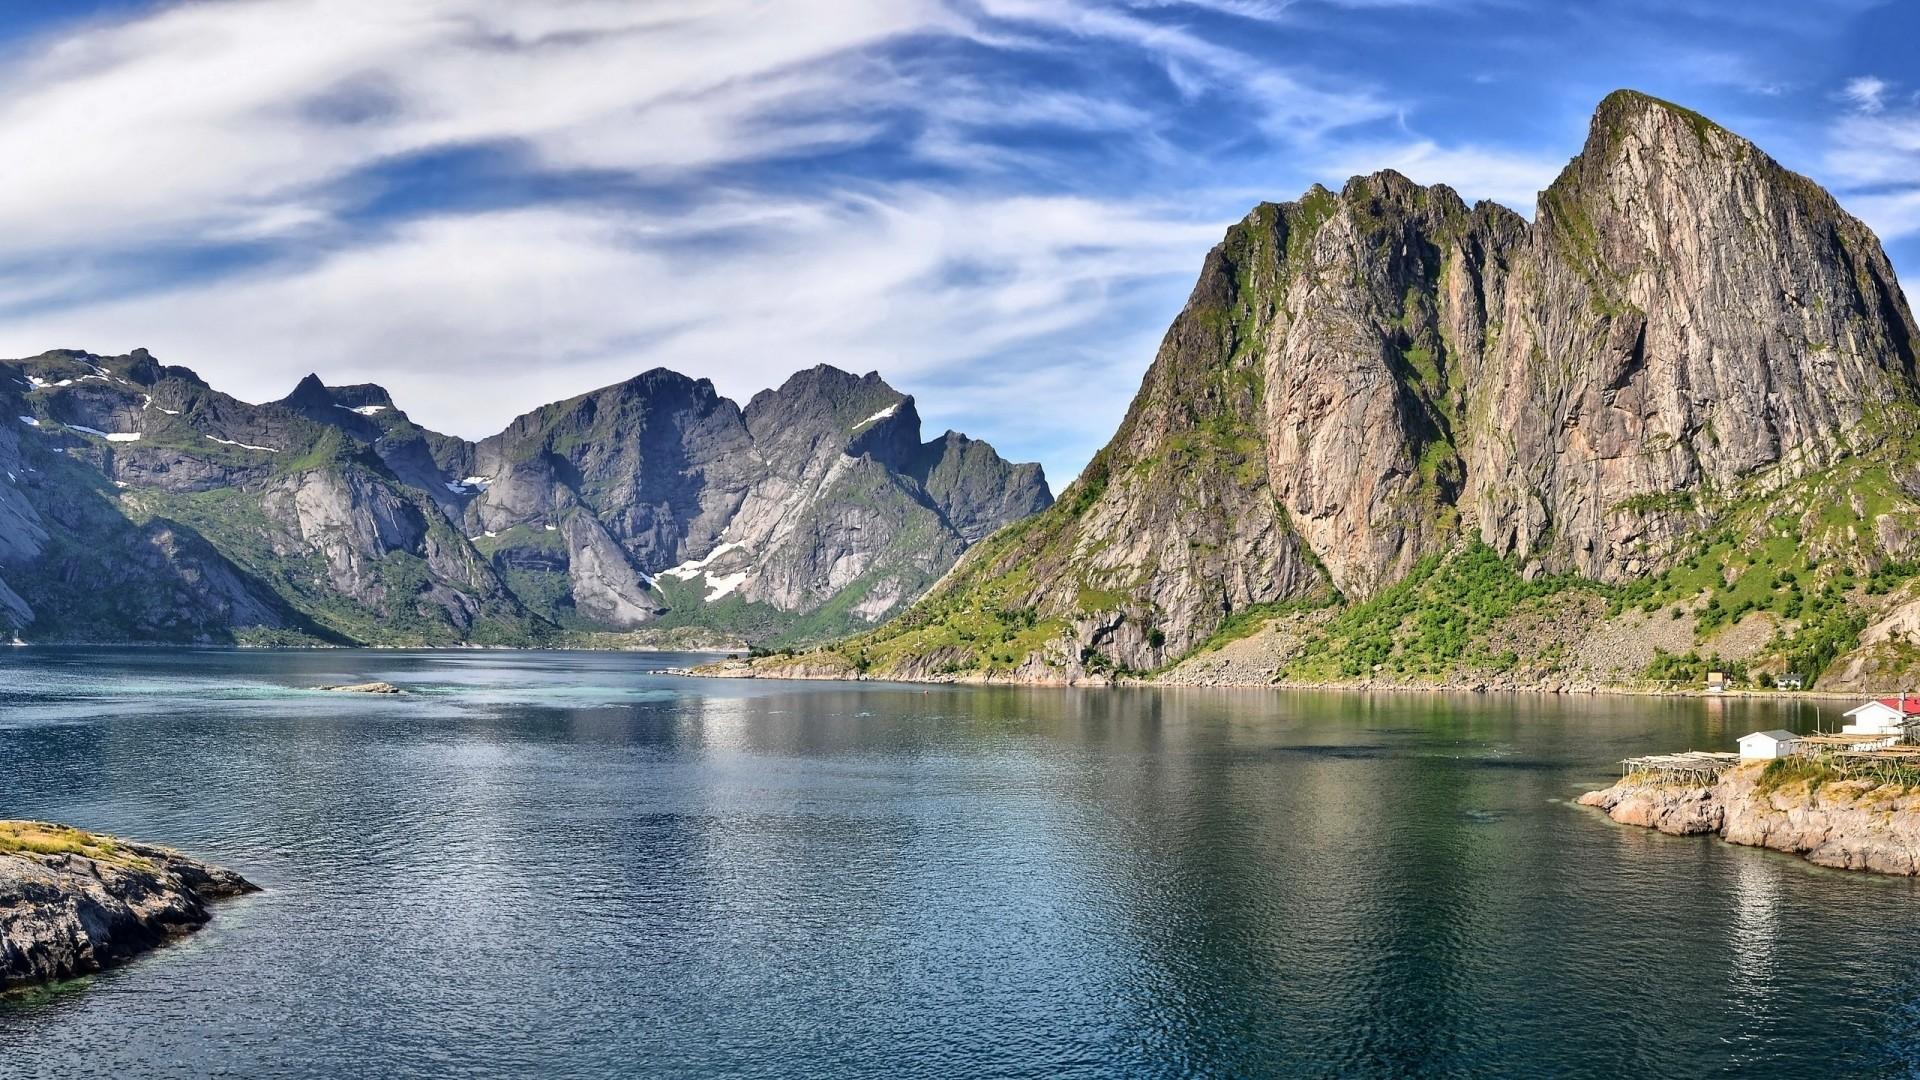 … Background Full HD 1080p. Wallpaper mountain, sky, lake,  summer